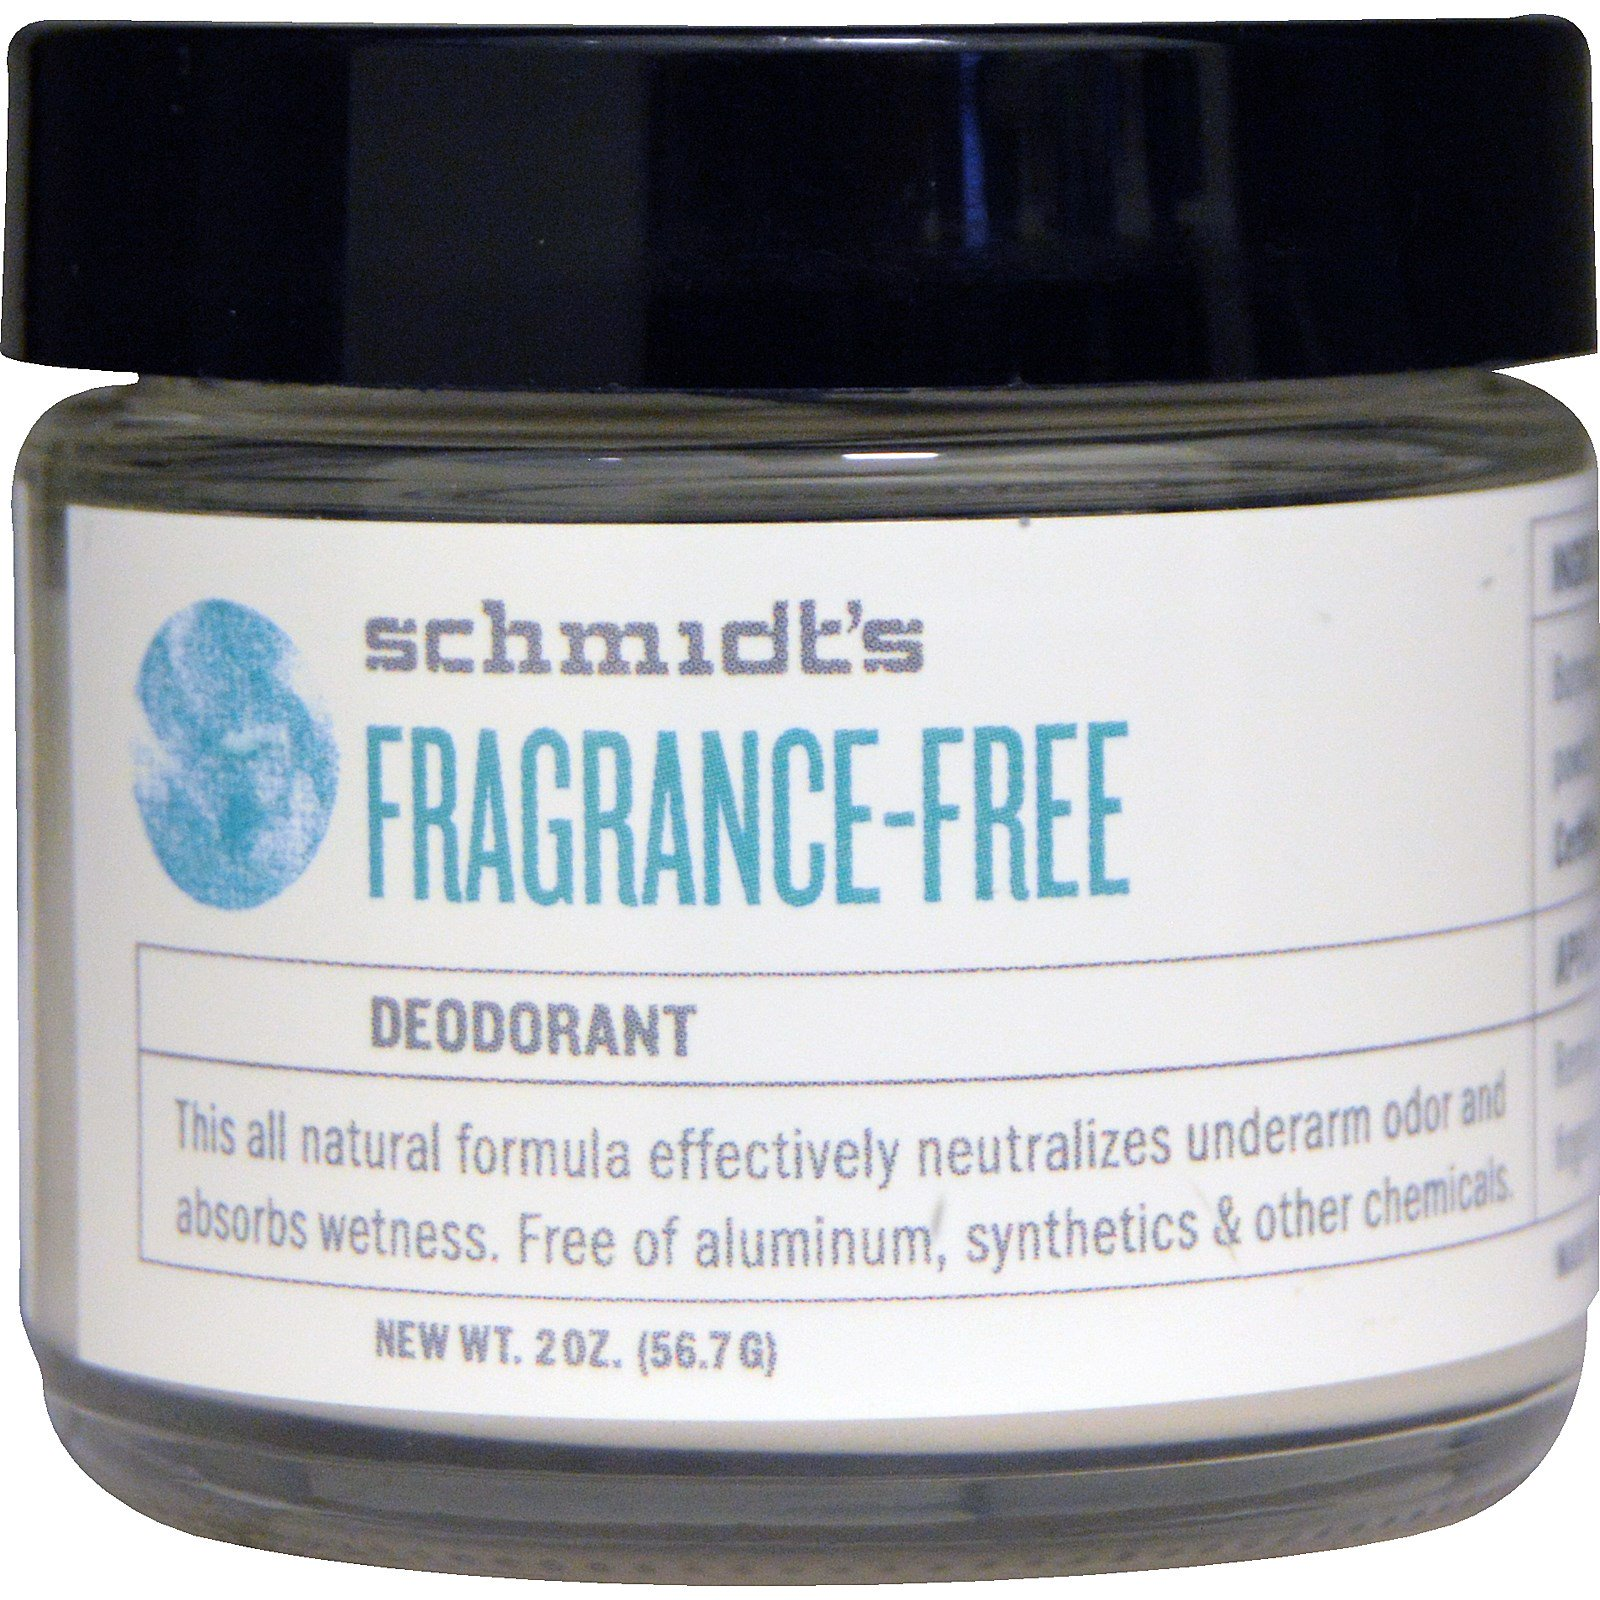 Schmidt's Natural Deodorant, Fragrance Free, 2 oz (56.7 g)